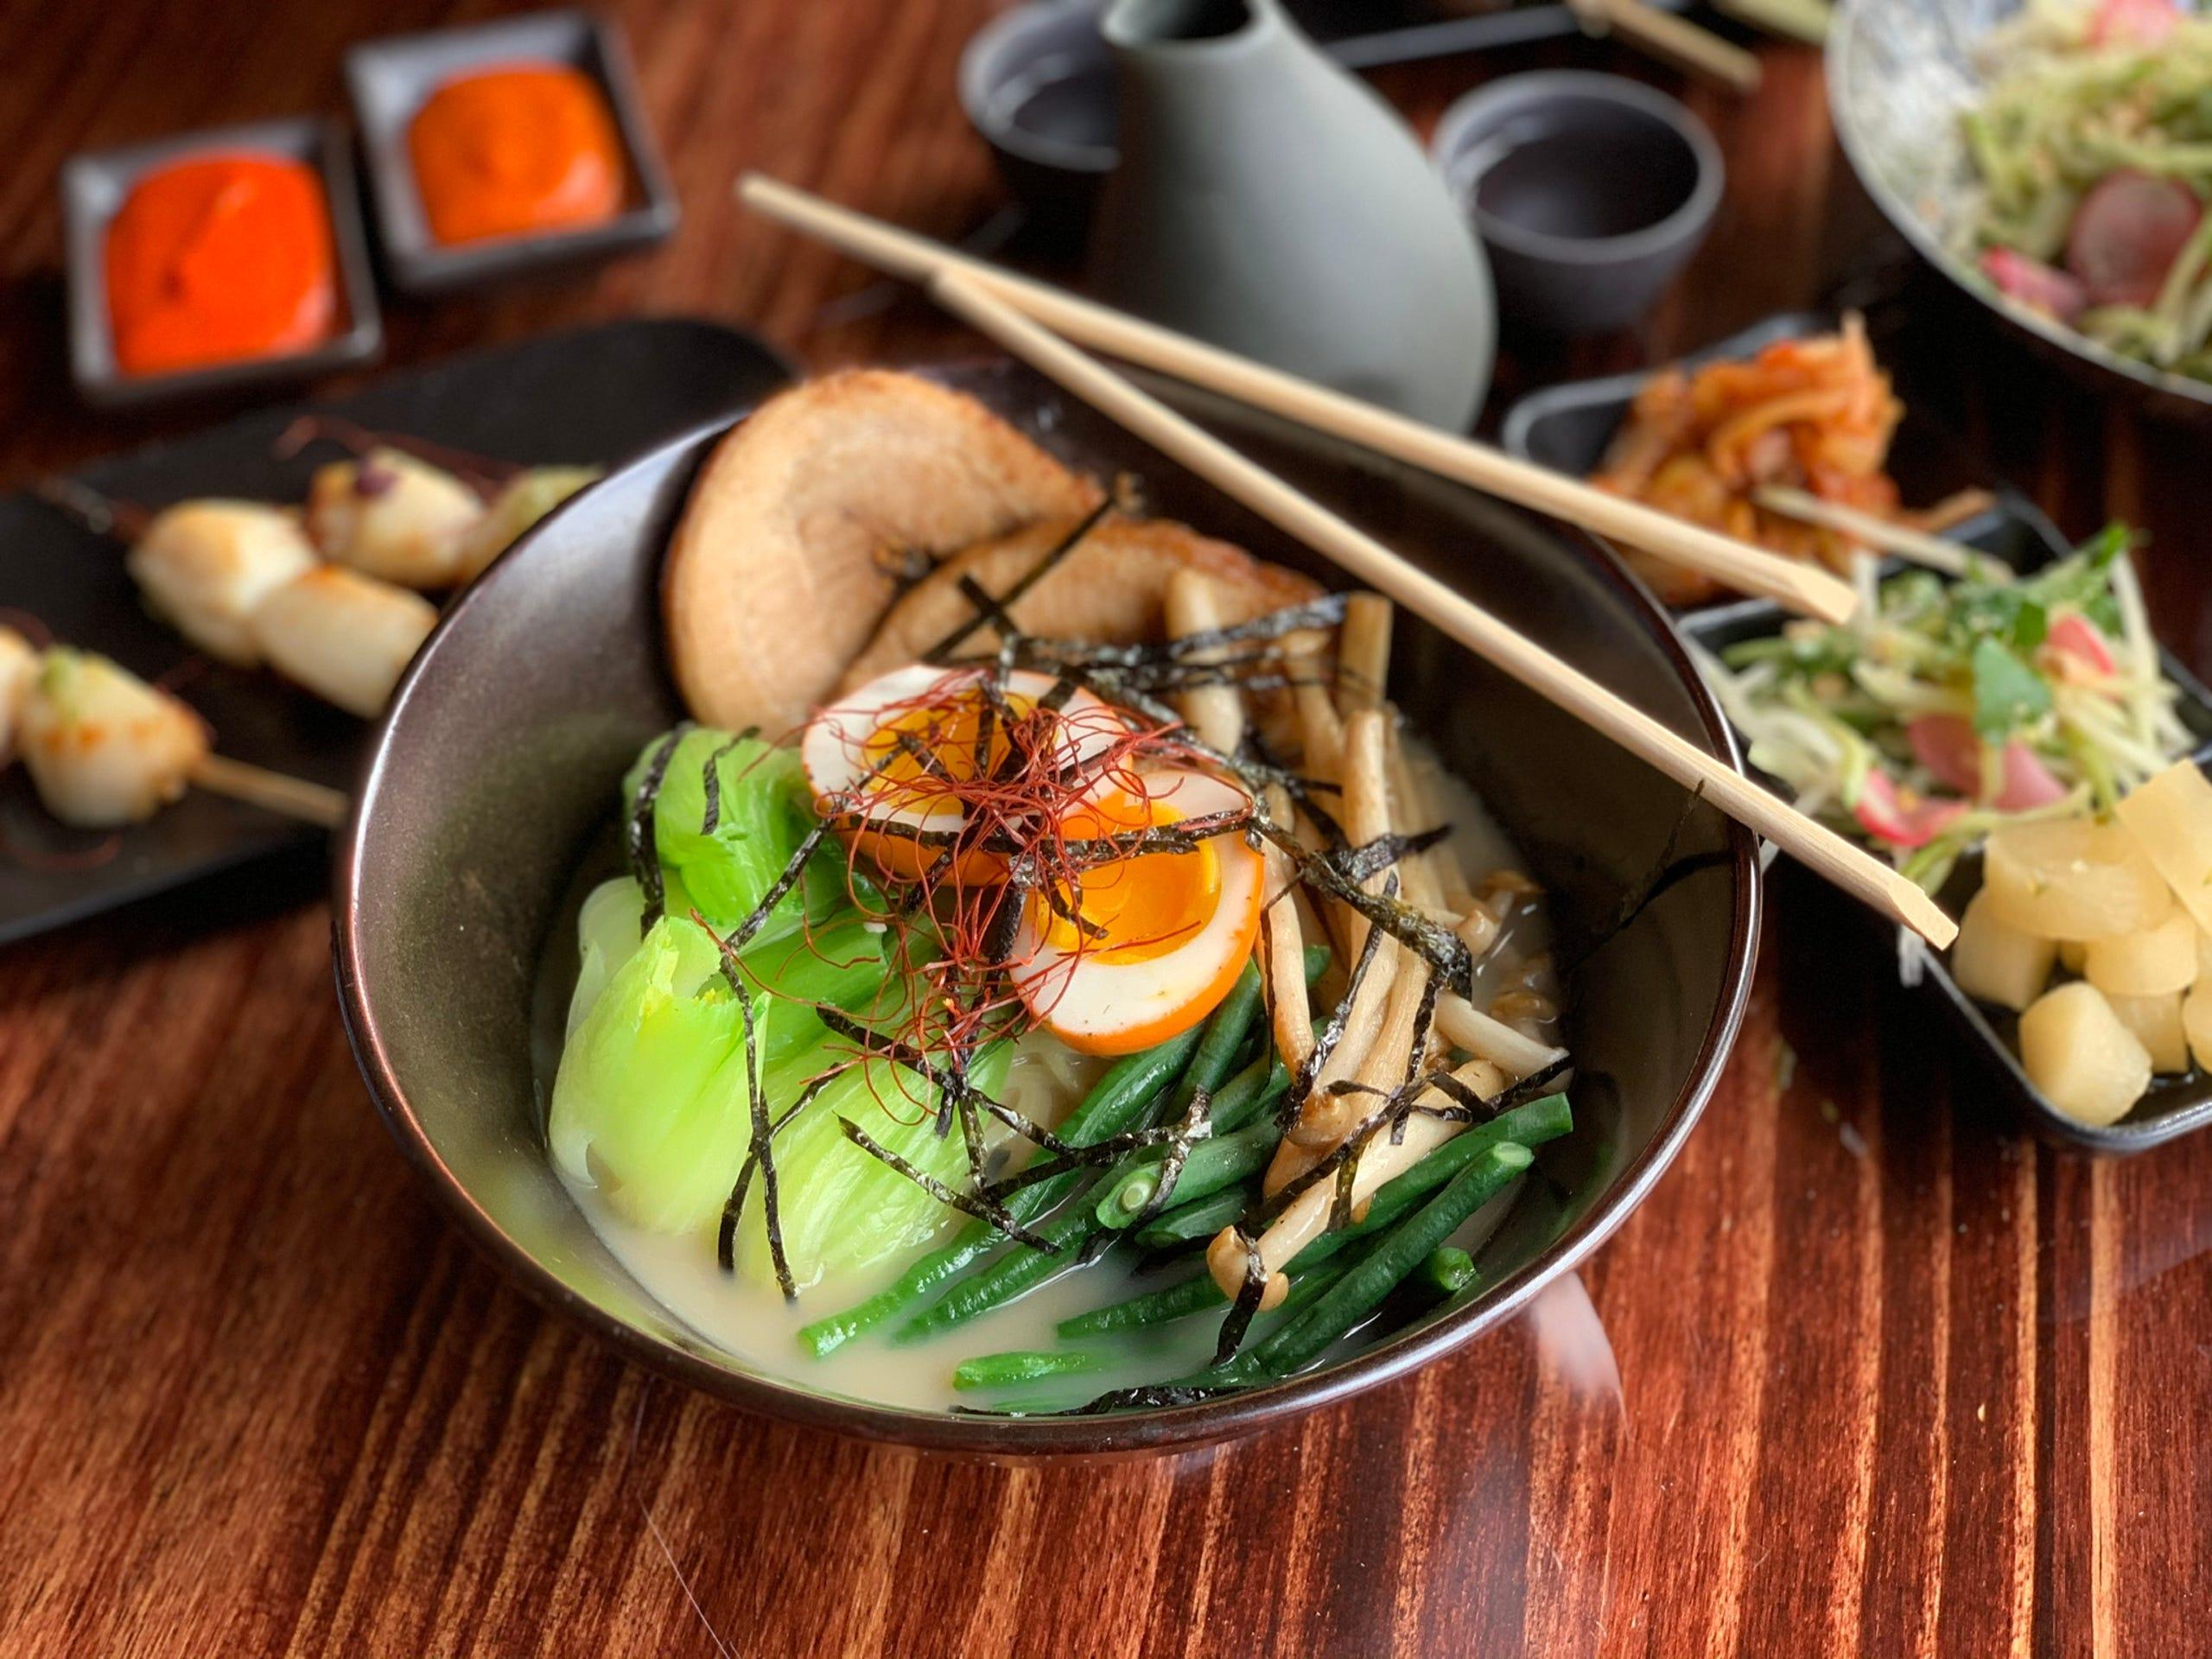 Indianapolis Restaurants Open Christmas 2020 Indianapolis restaurants: Seraphim Asian Grill opens in Broad Ripple